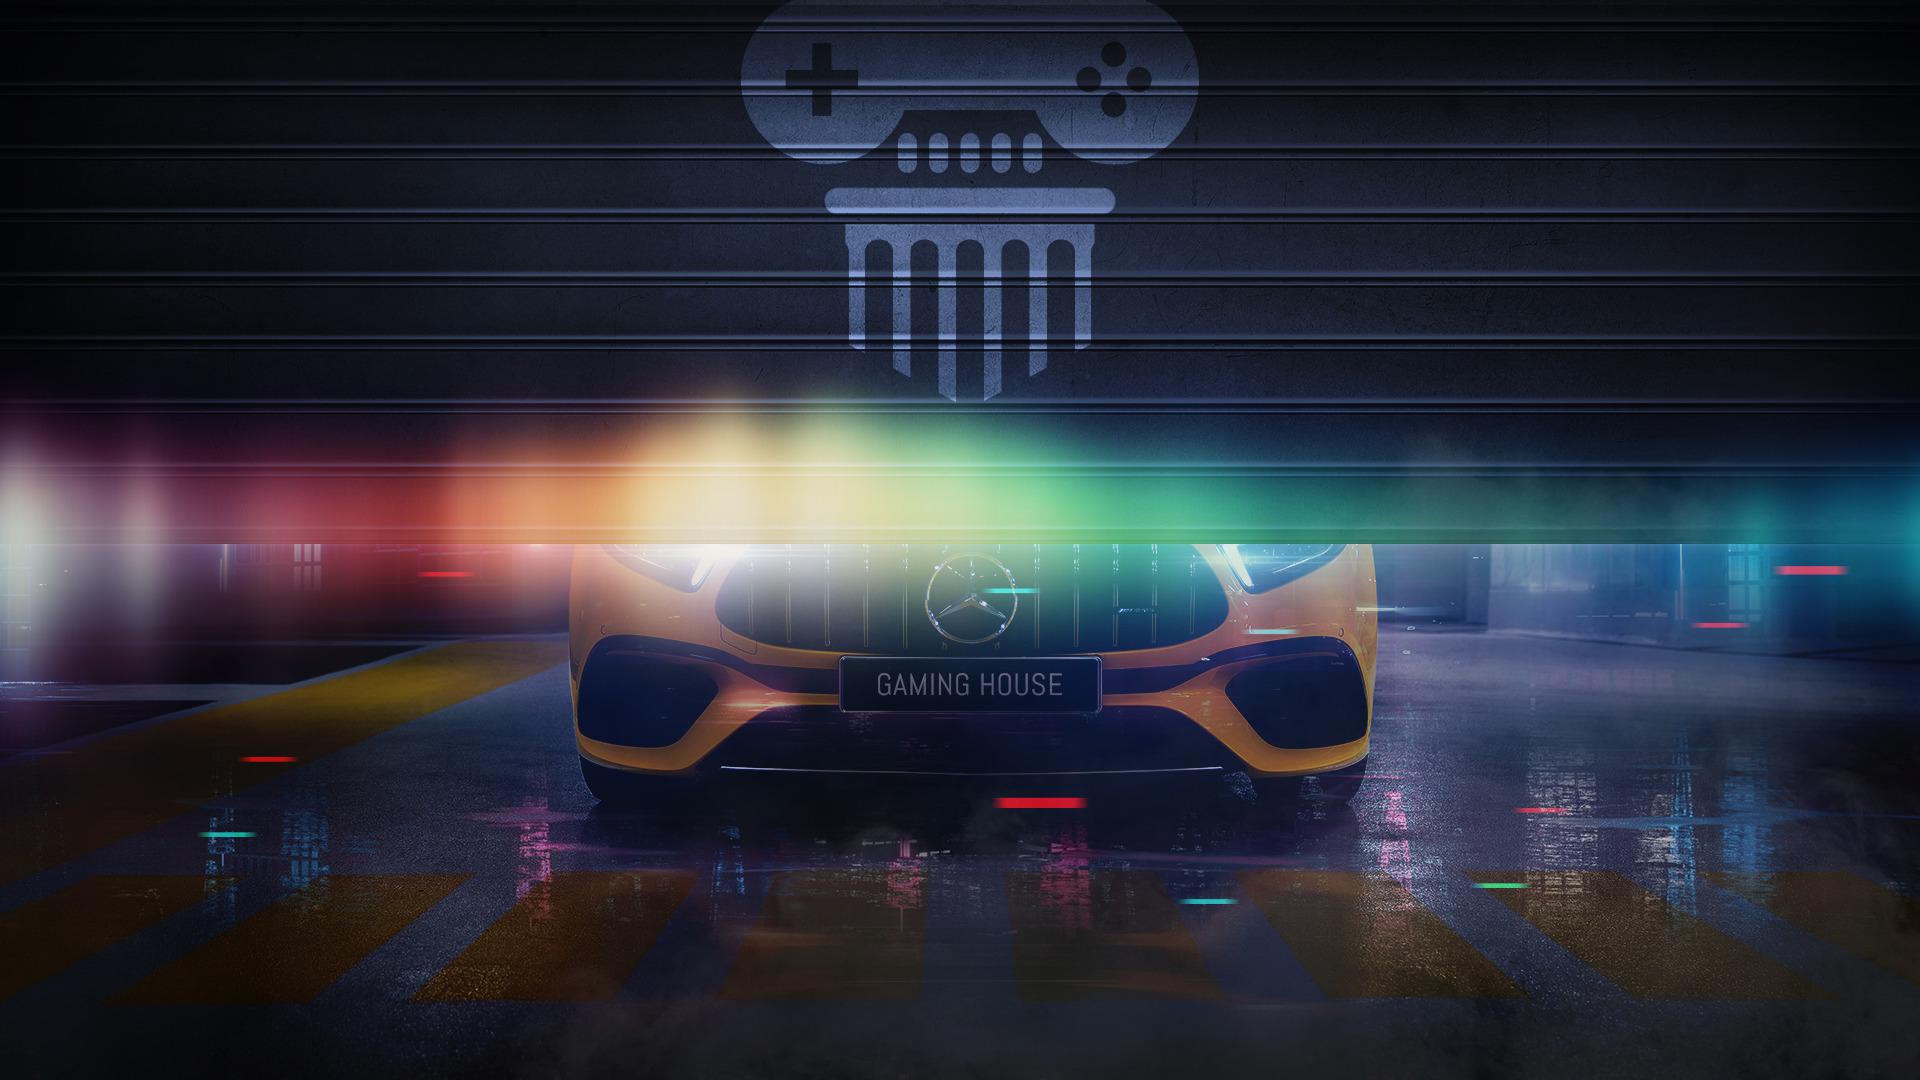 Mercedes sponsor Mkers